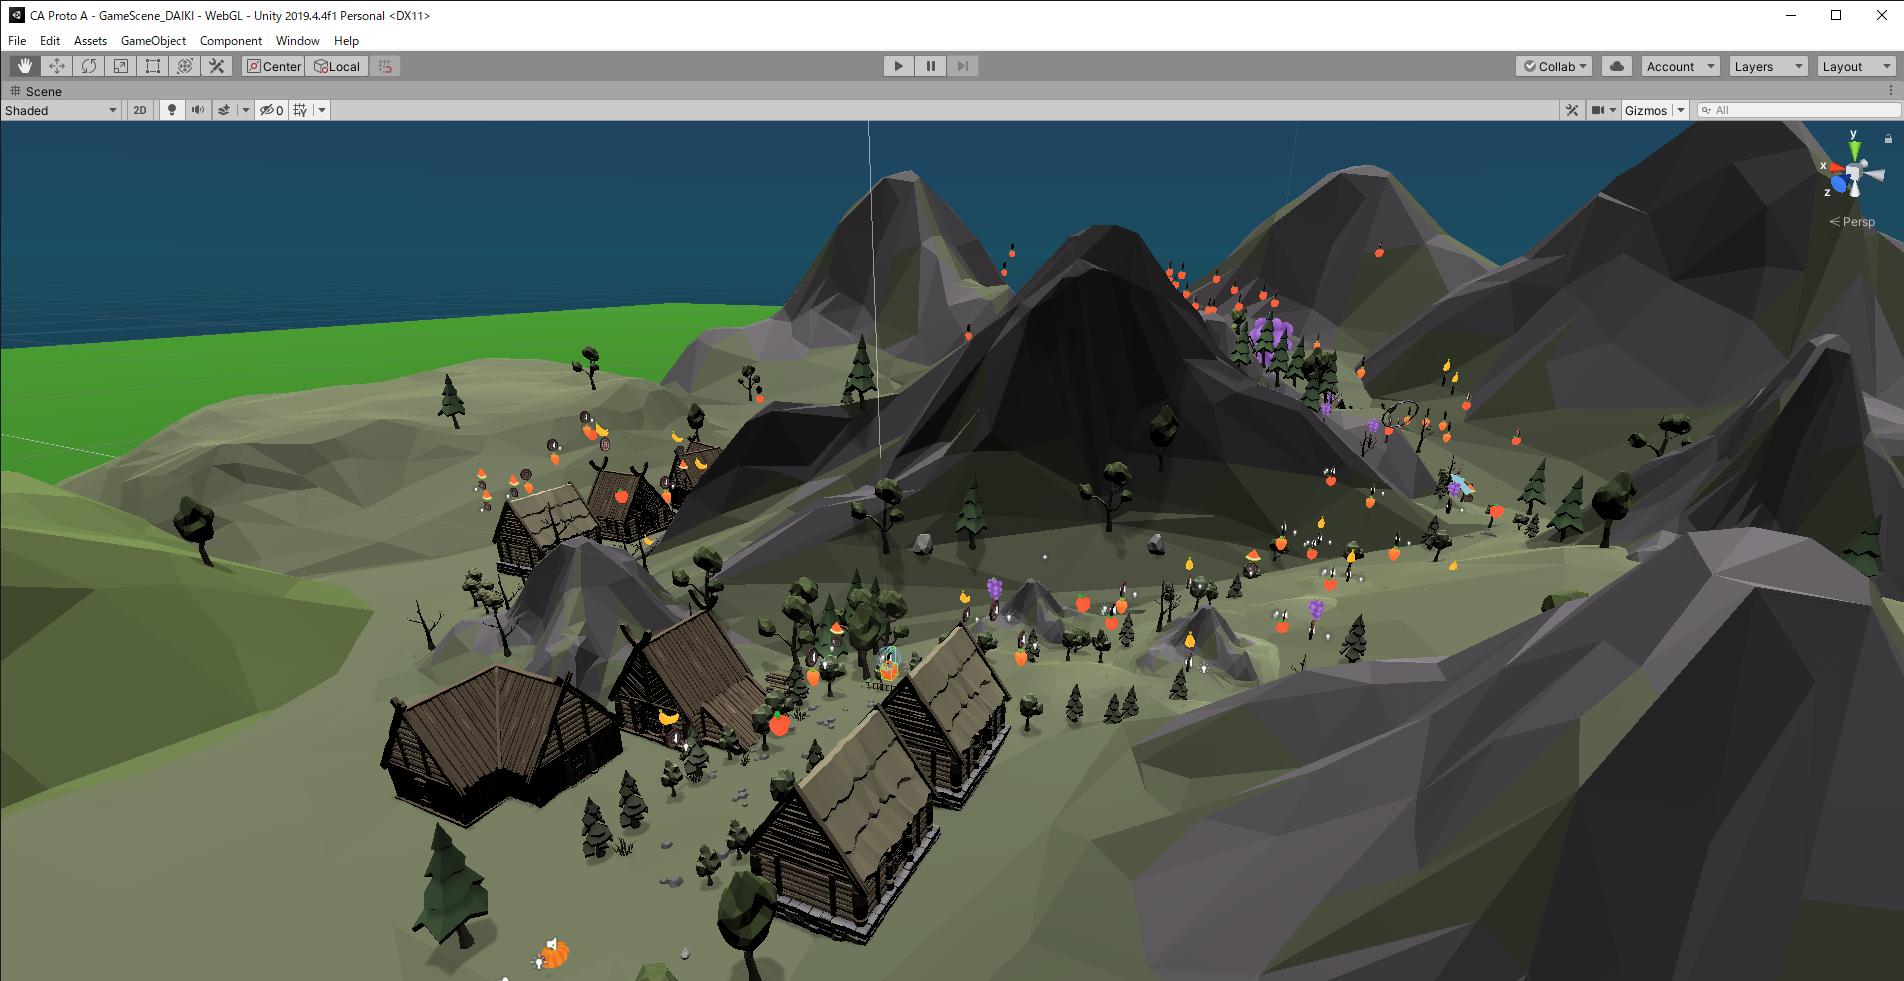 CA Proto A - GameScene_DAIKI - WebGL - Unity 2019.4.4f1 Personal _DX11_ 2020_09_30 0_16_22.png